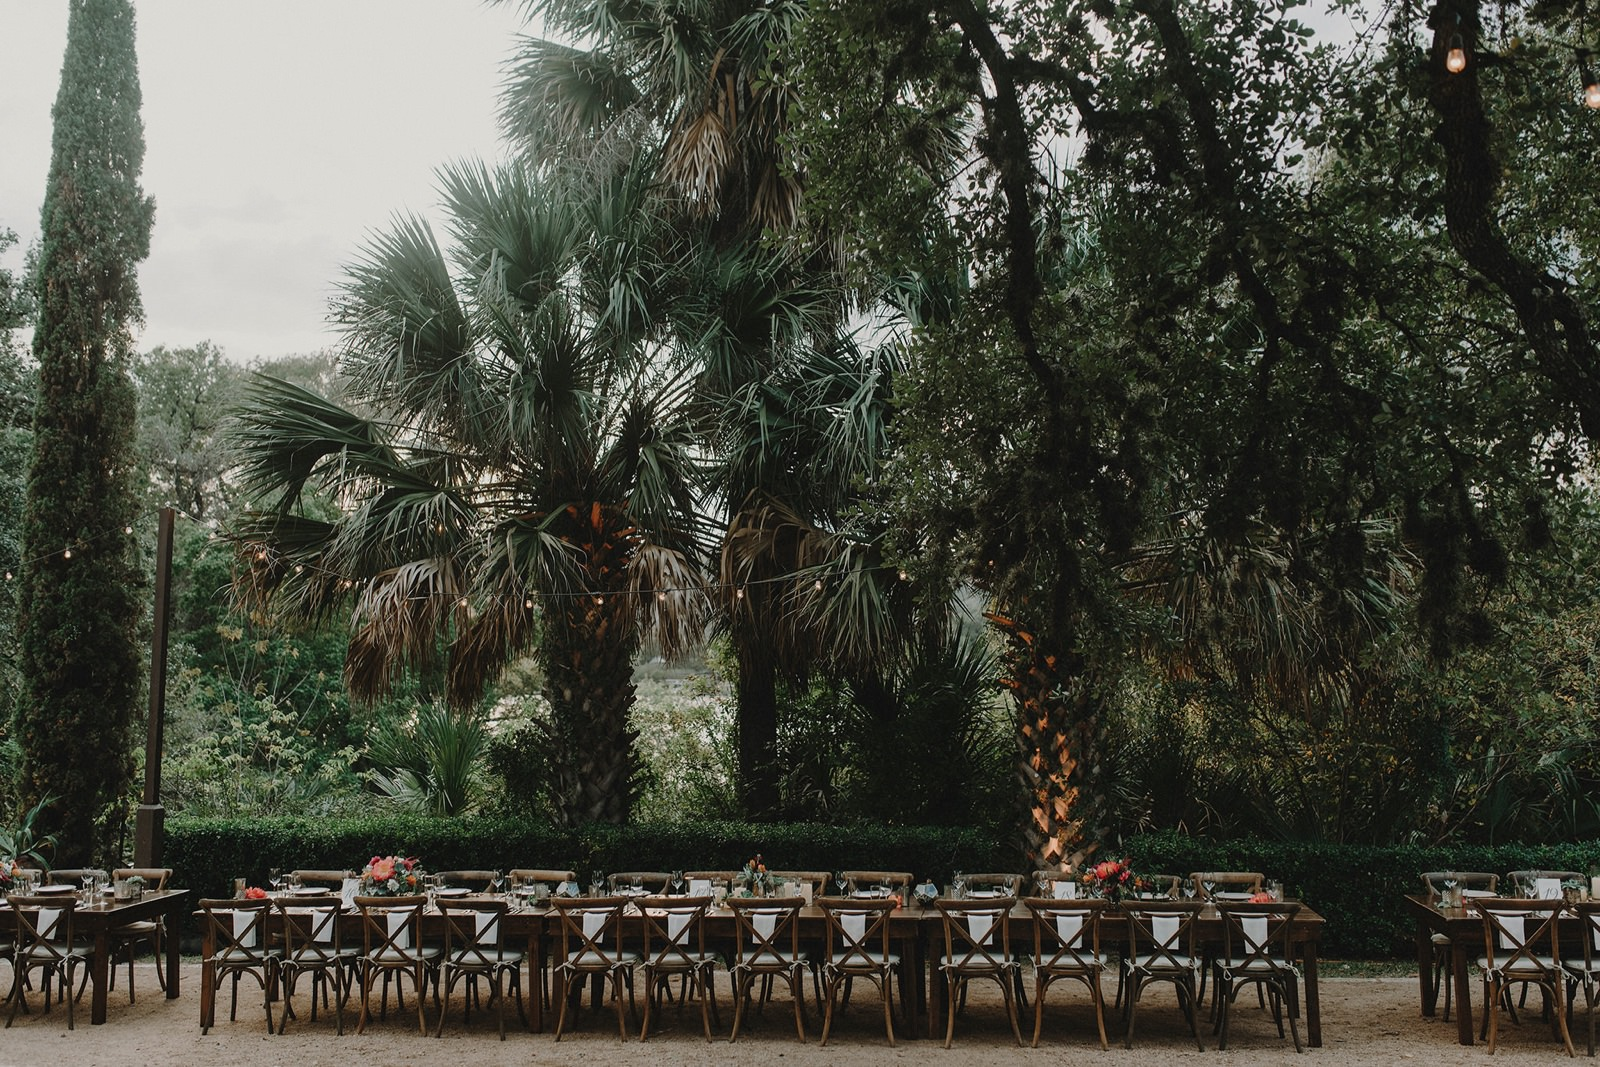 Garden party wedding reception space in Austin at Laguna Gloria